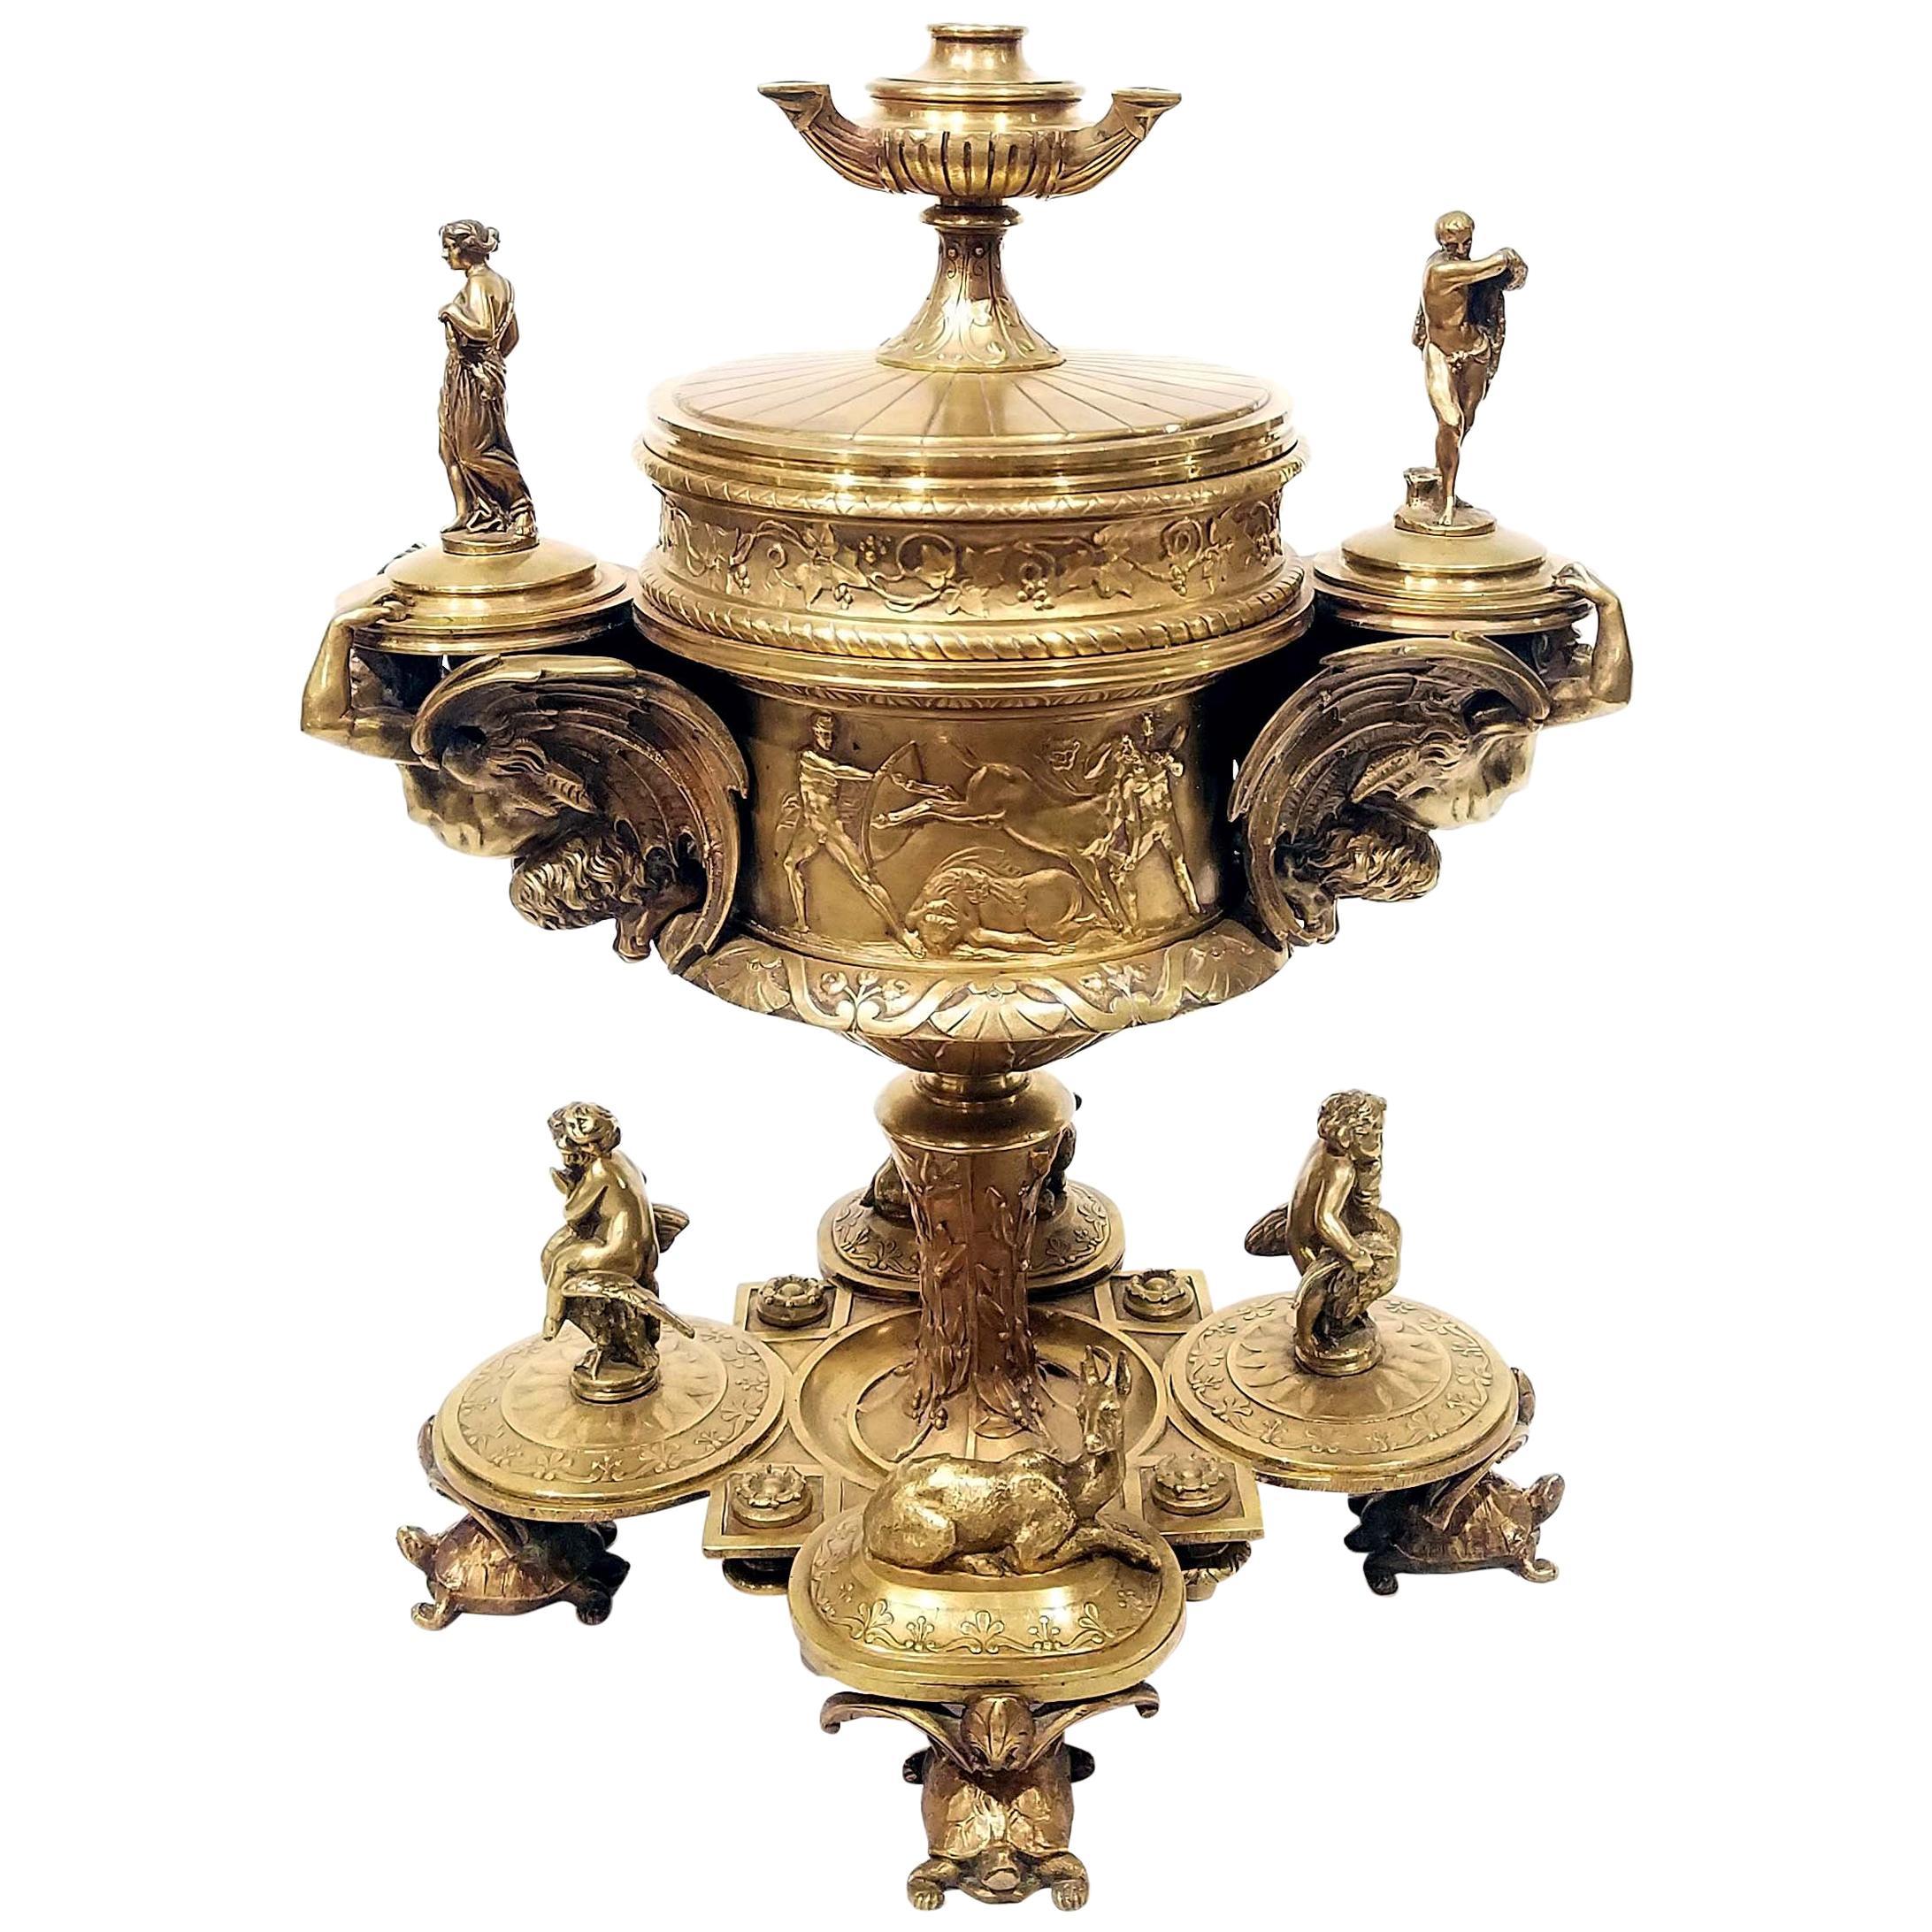 Maison Alphonse Giroux Bronze Cigar Container, 19th Century